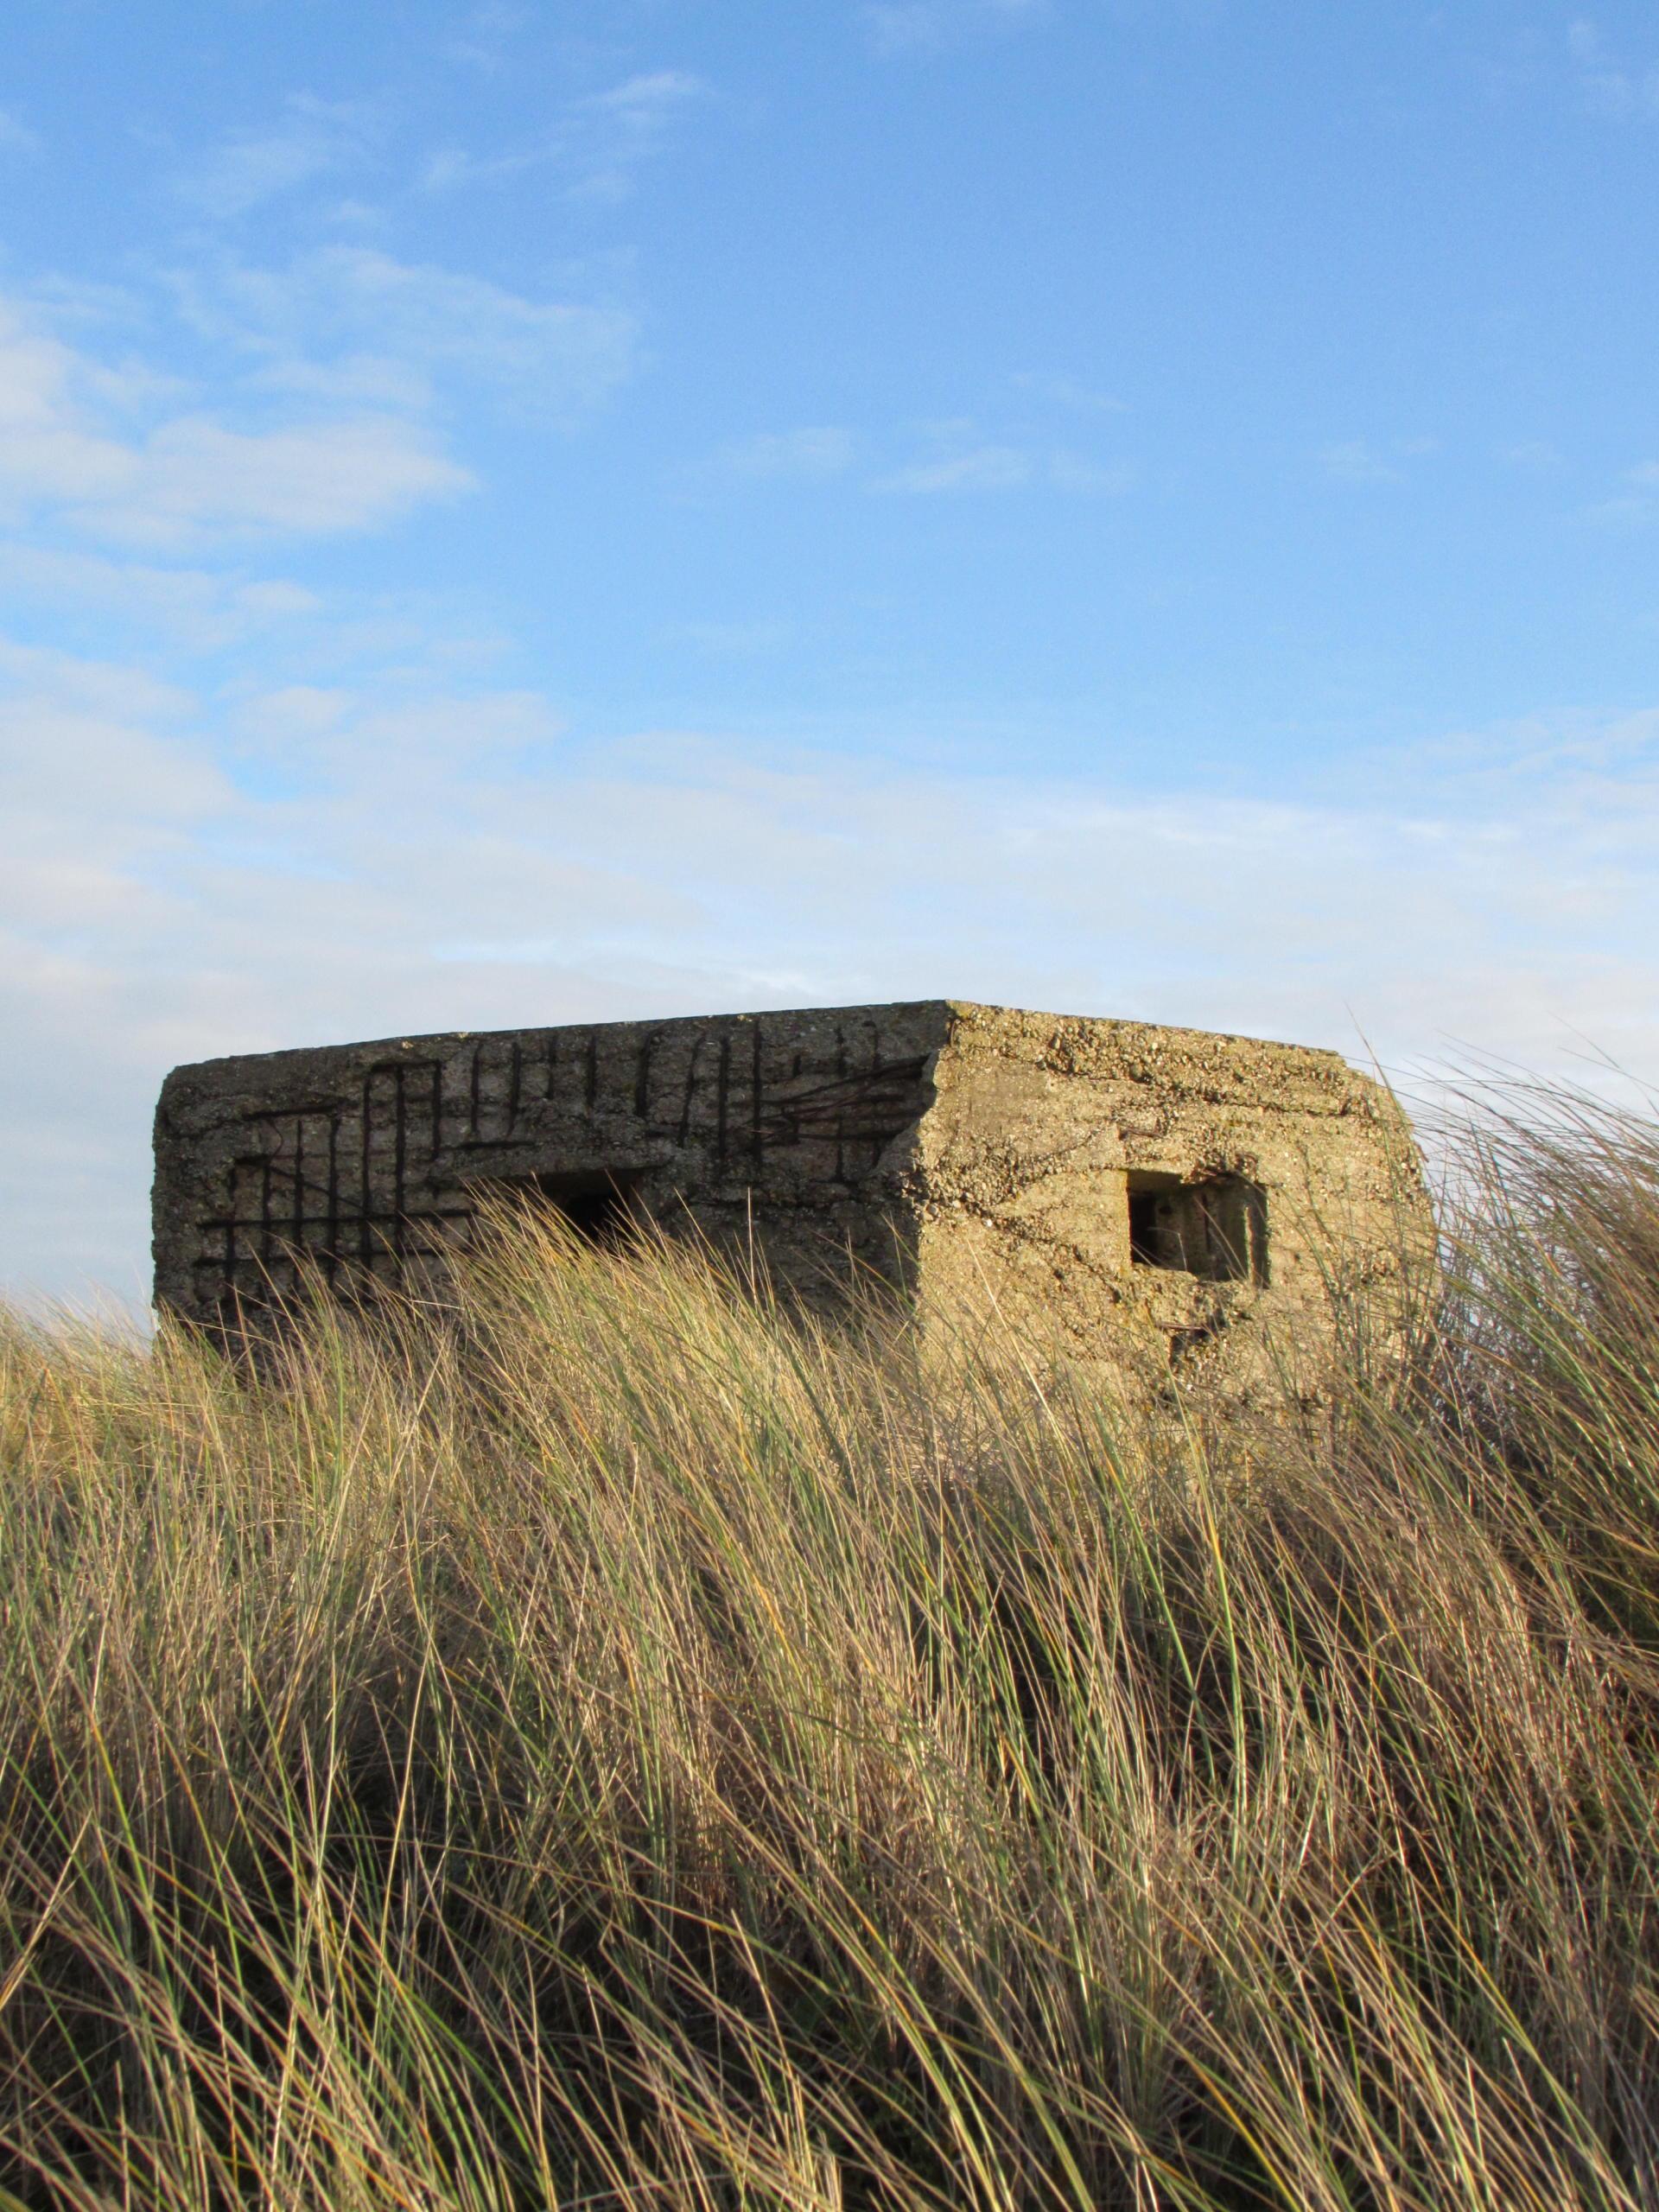 Seal Watching in North Norfolk - Yesihaveablog | World War II Pillbox Horsey | WW2 | Norfolk - Life in a Fine City | Winterlust